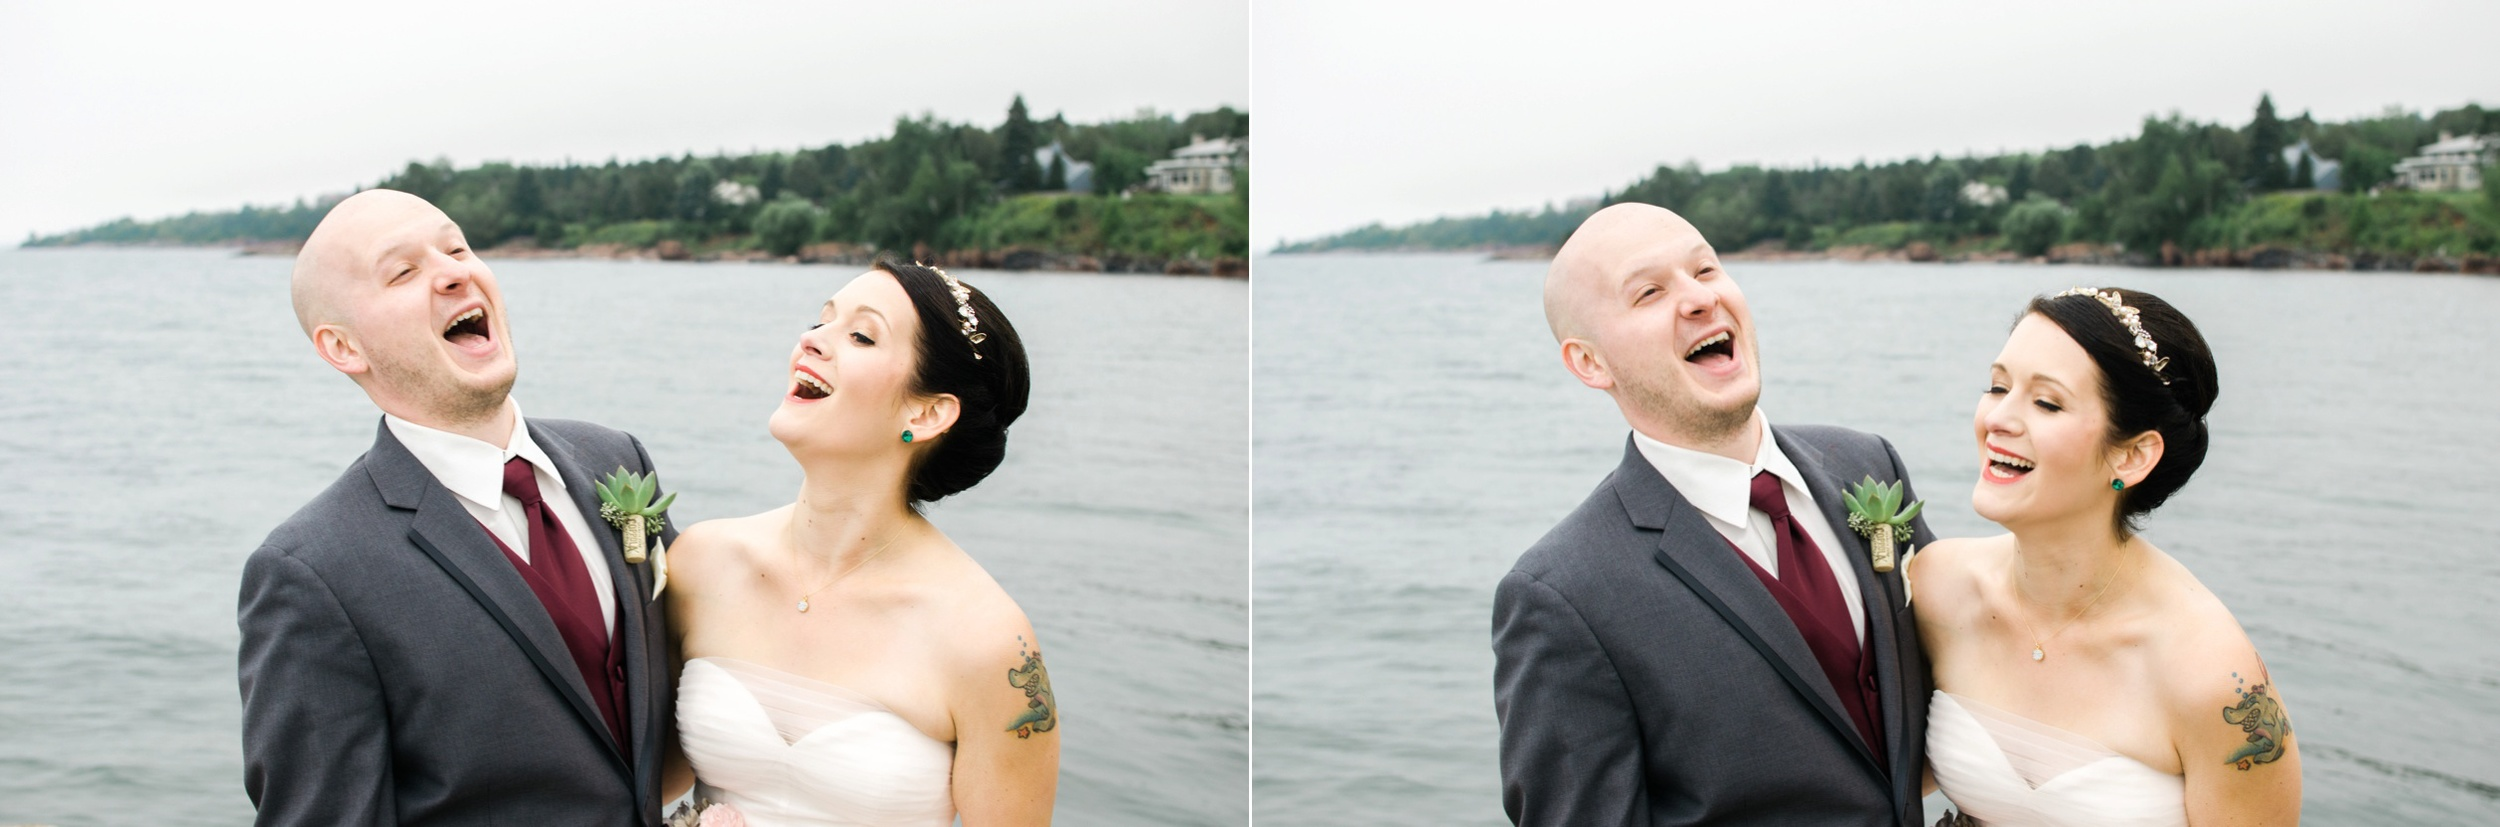 Glensheen Mansion Wedding | Duluth, MN Wedding Photographer_0498.jpg